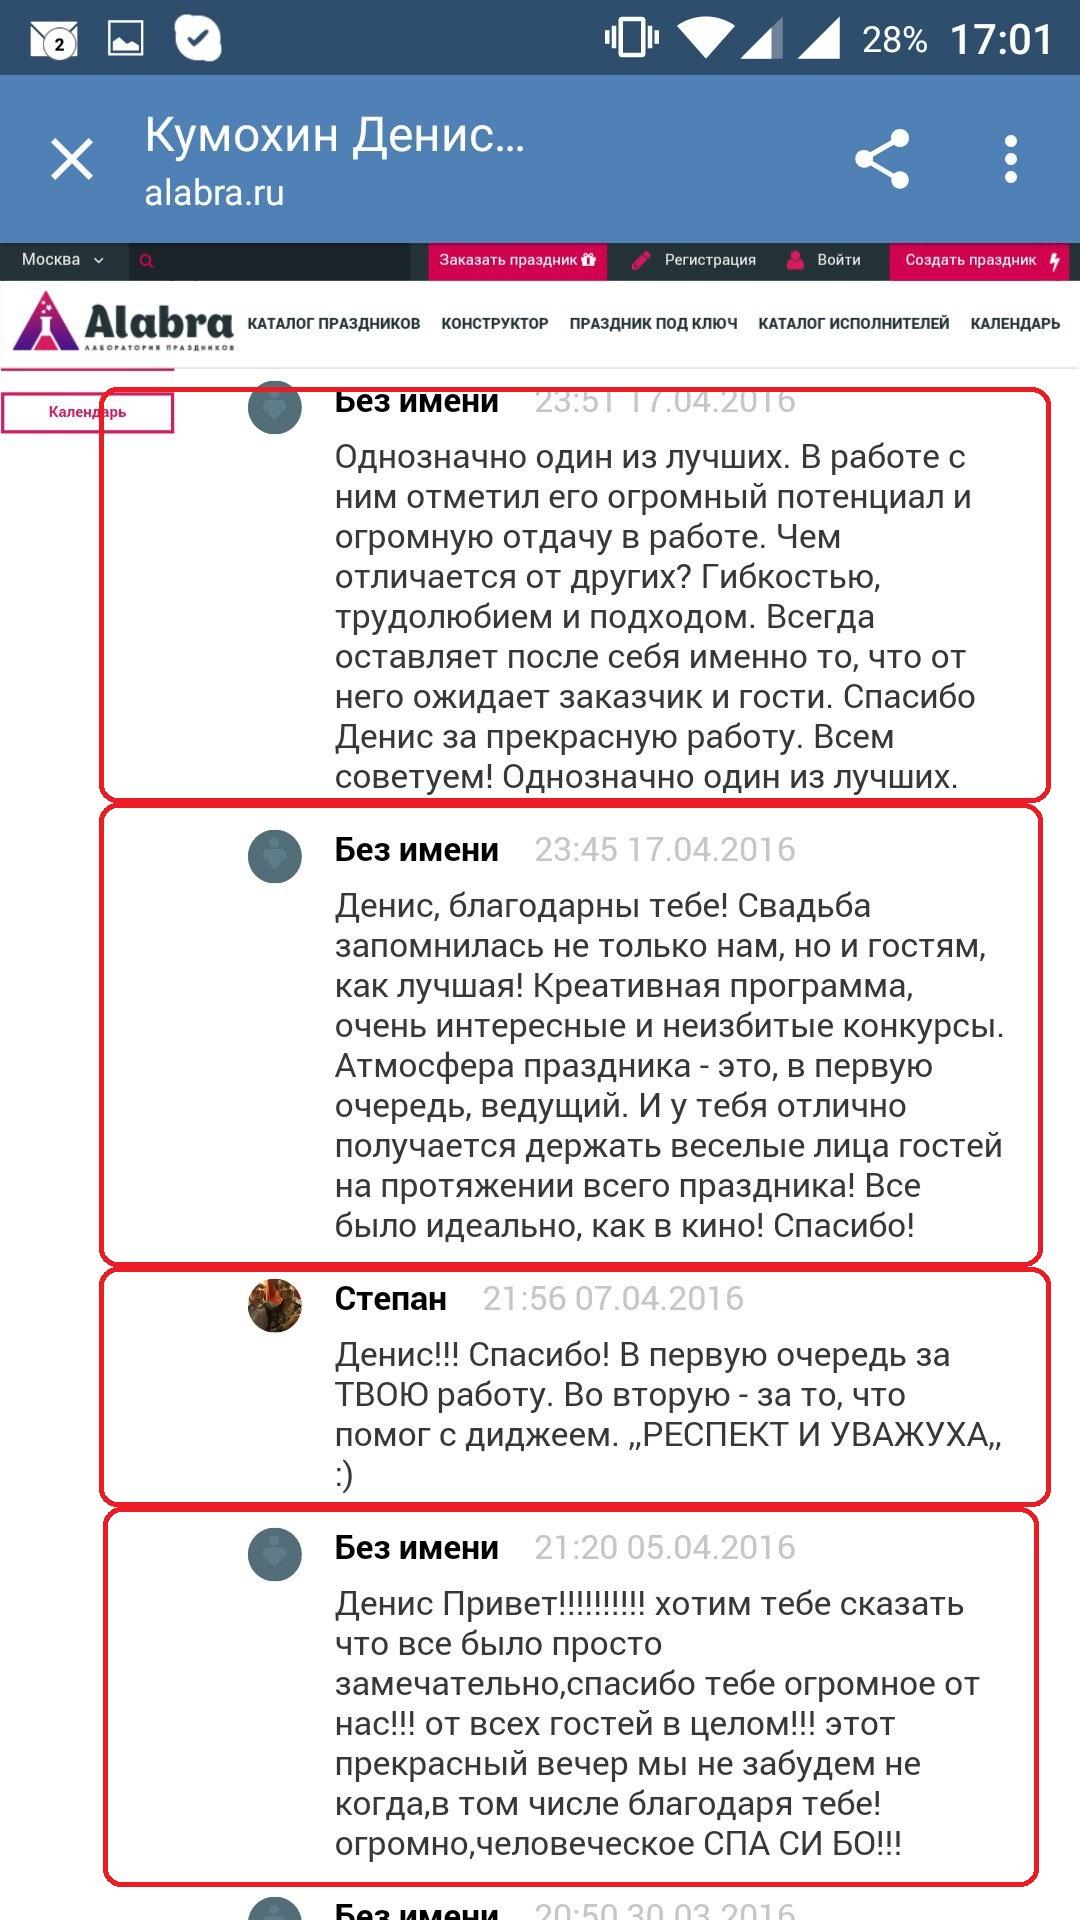 отзыв НЕ тамада Денис Кумохин